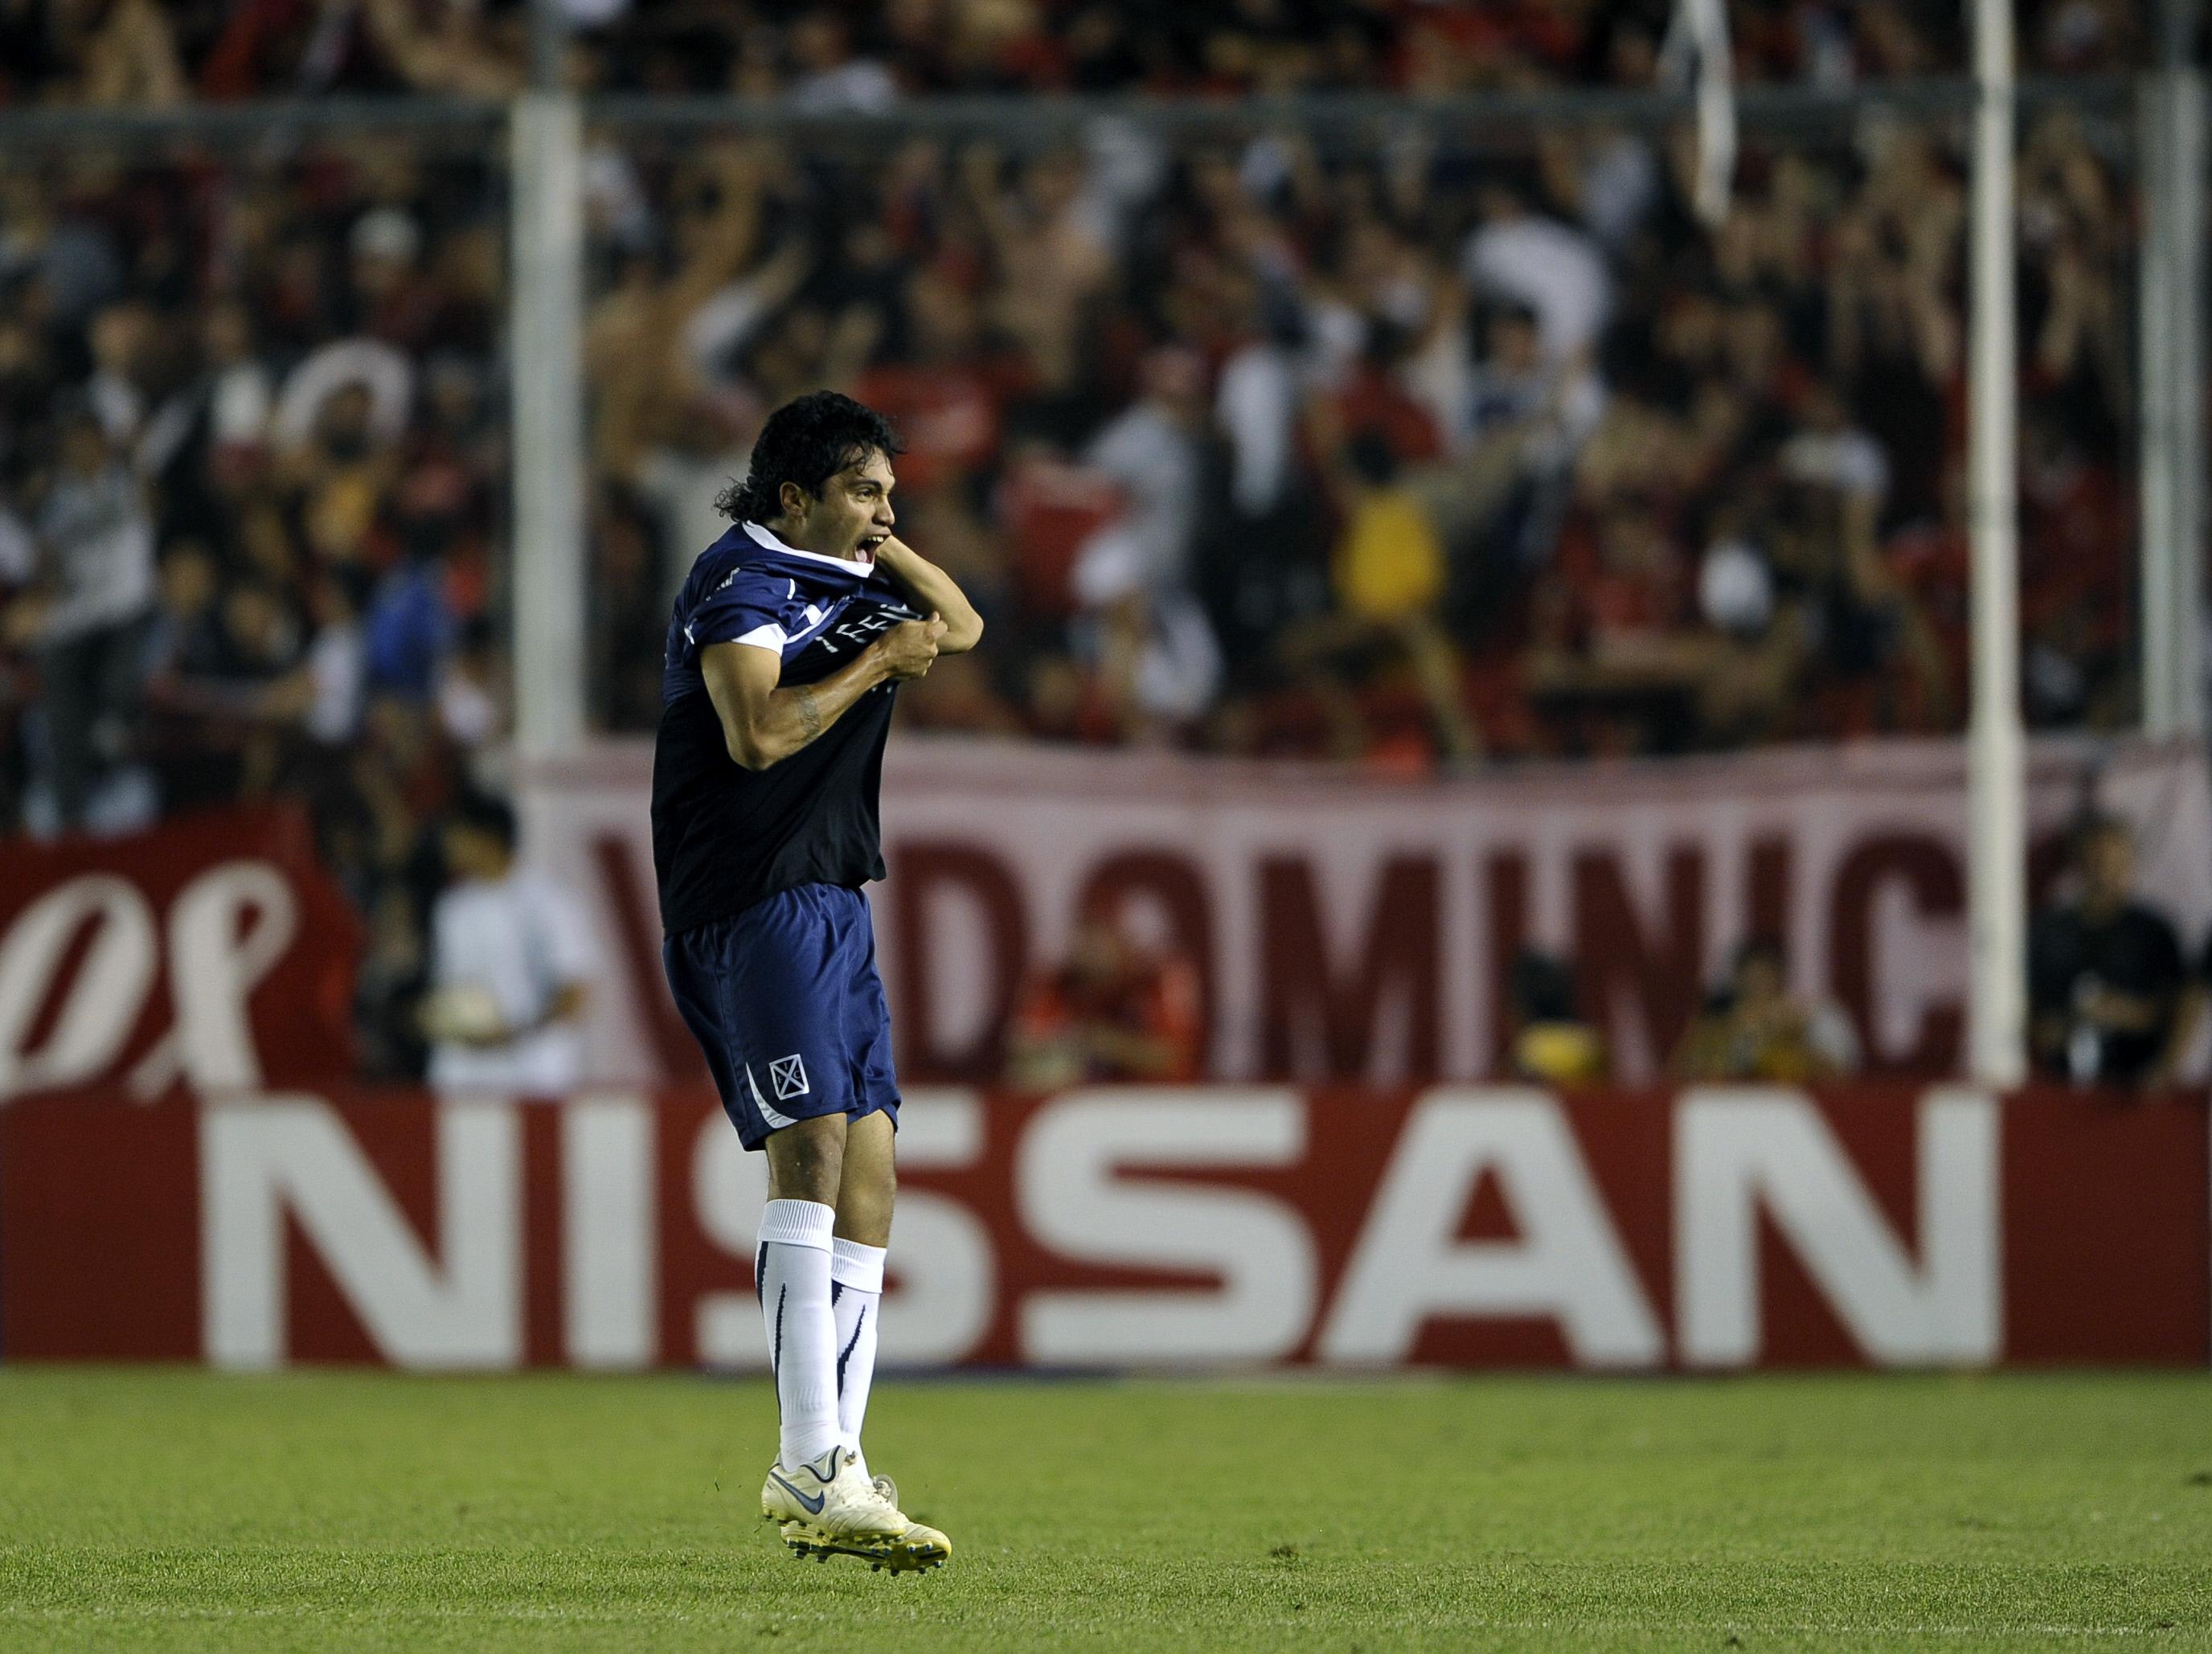 Calciomercato Palermo, ultime notizie: ecco Velazquez